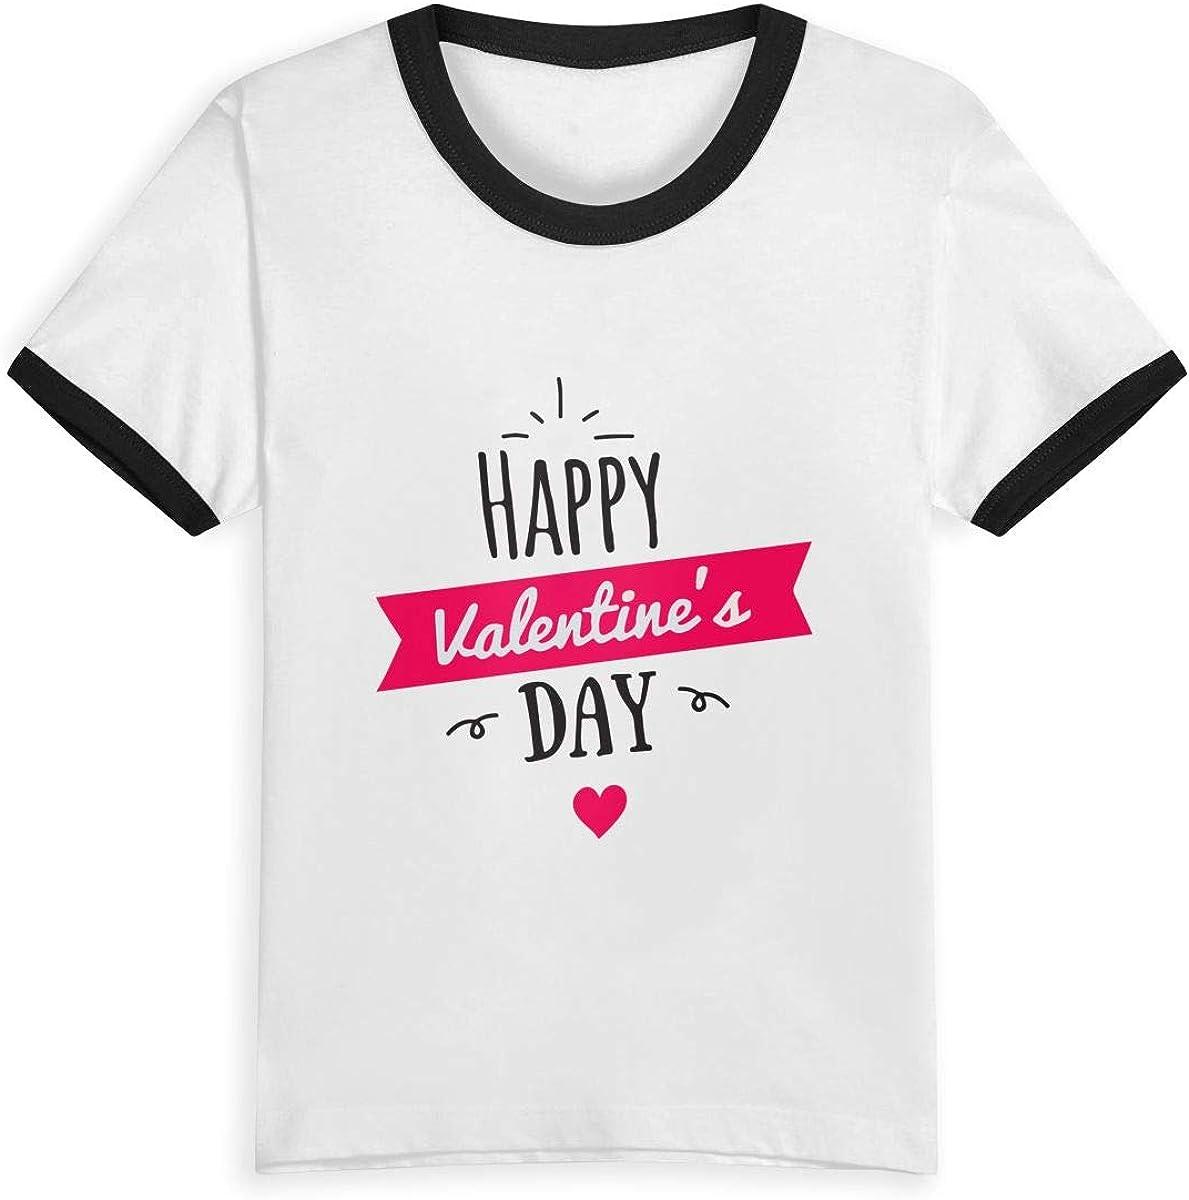 CY SHOP February Childrens Boys Girls Contrast Short Sleeve T-Shirt